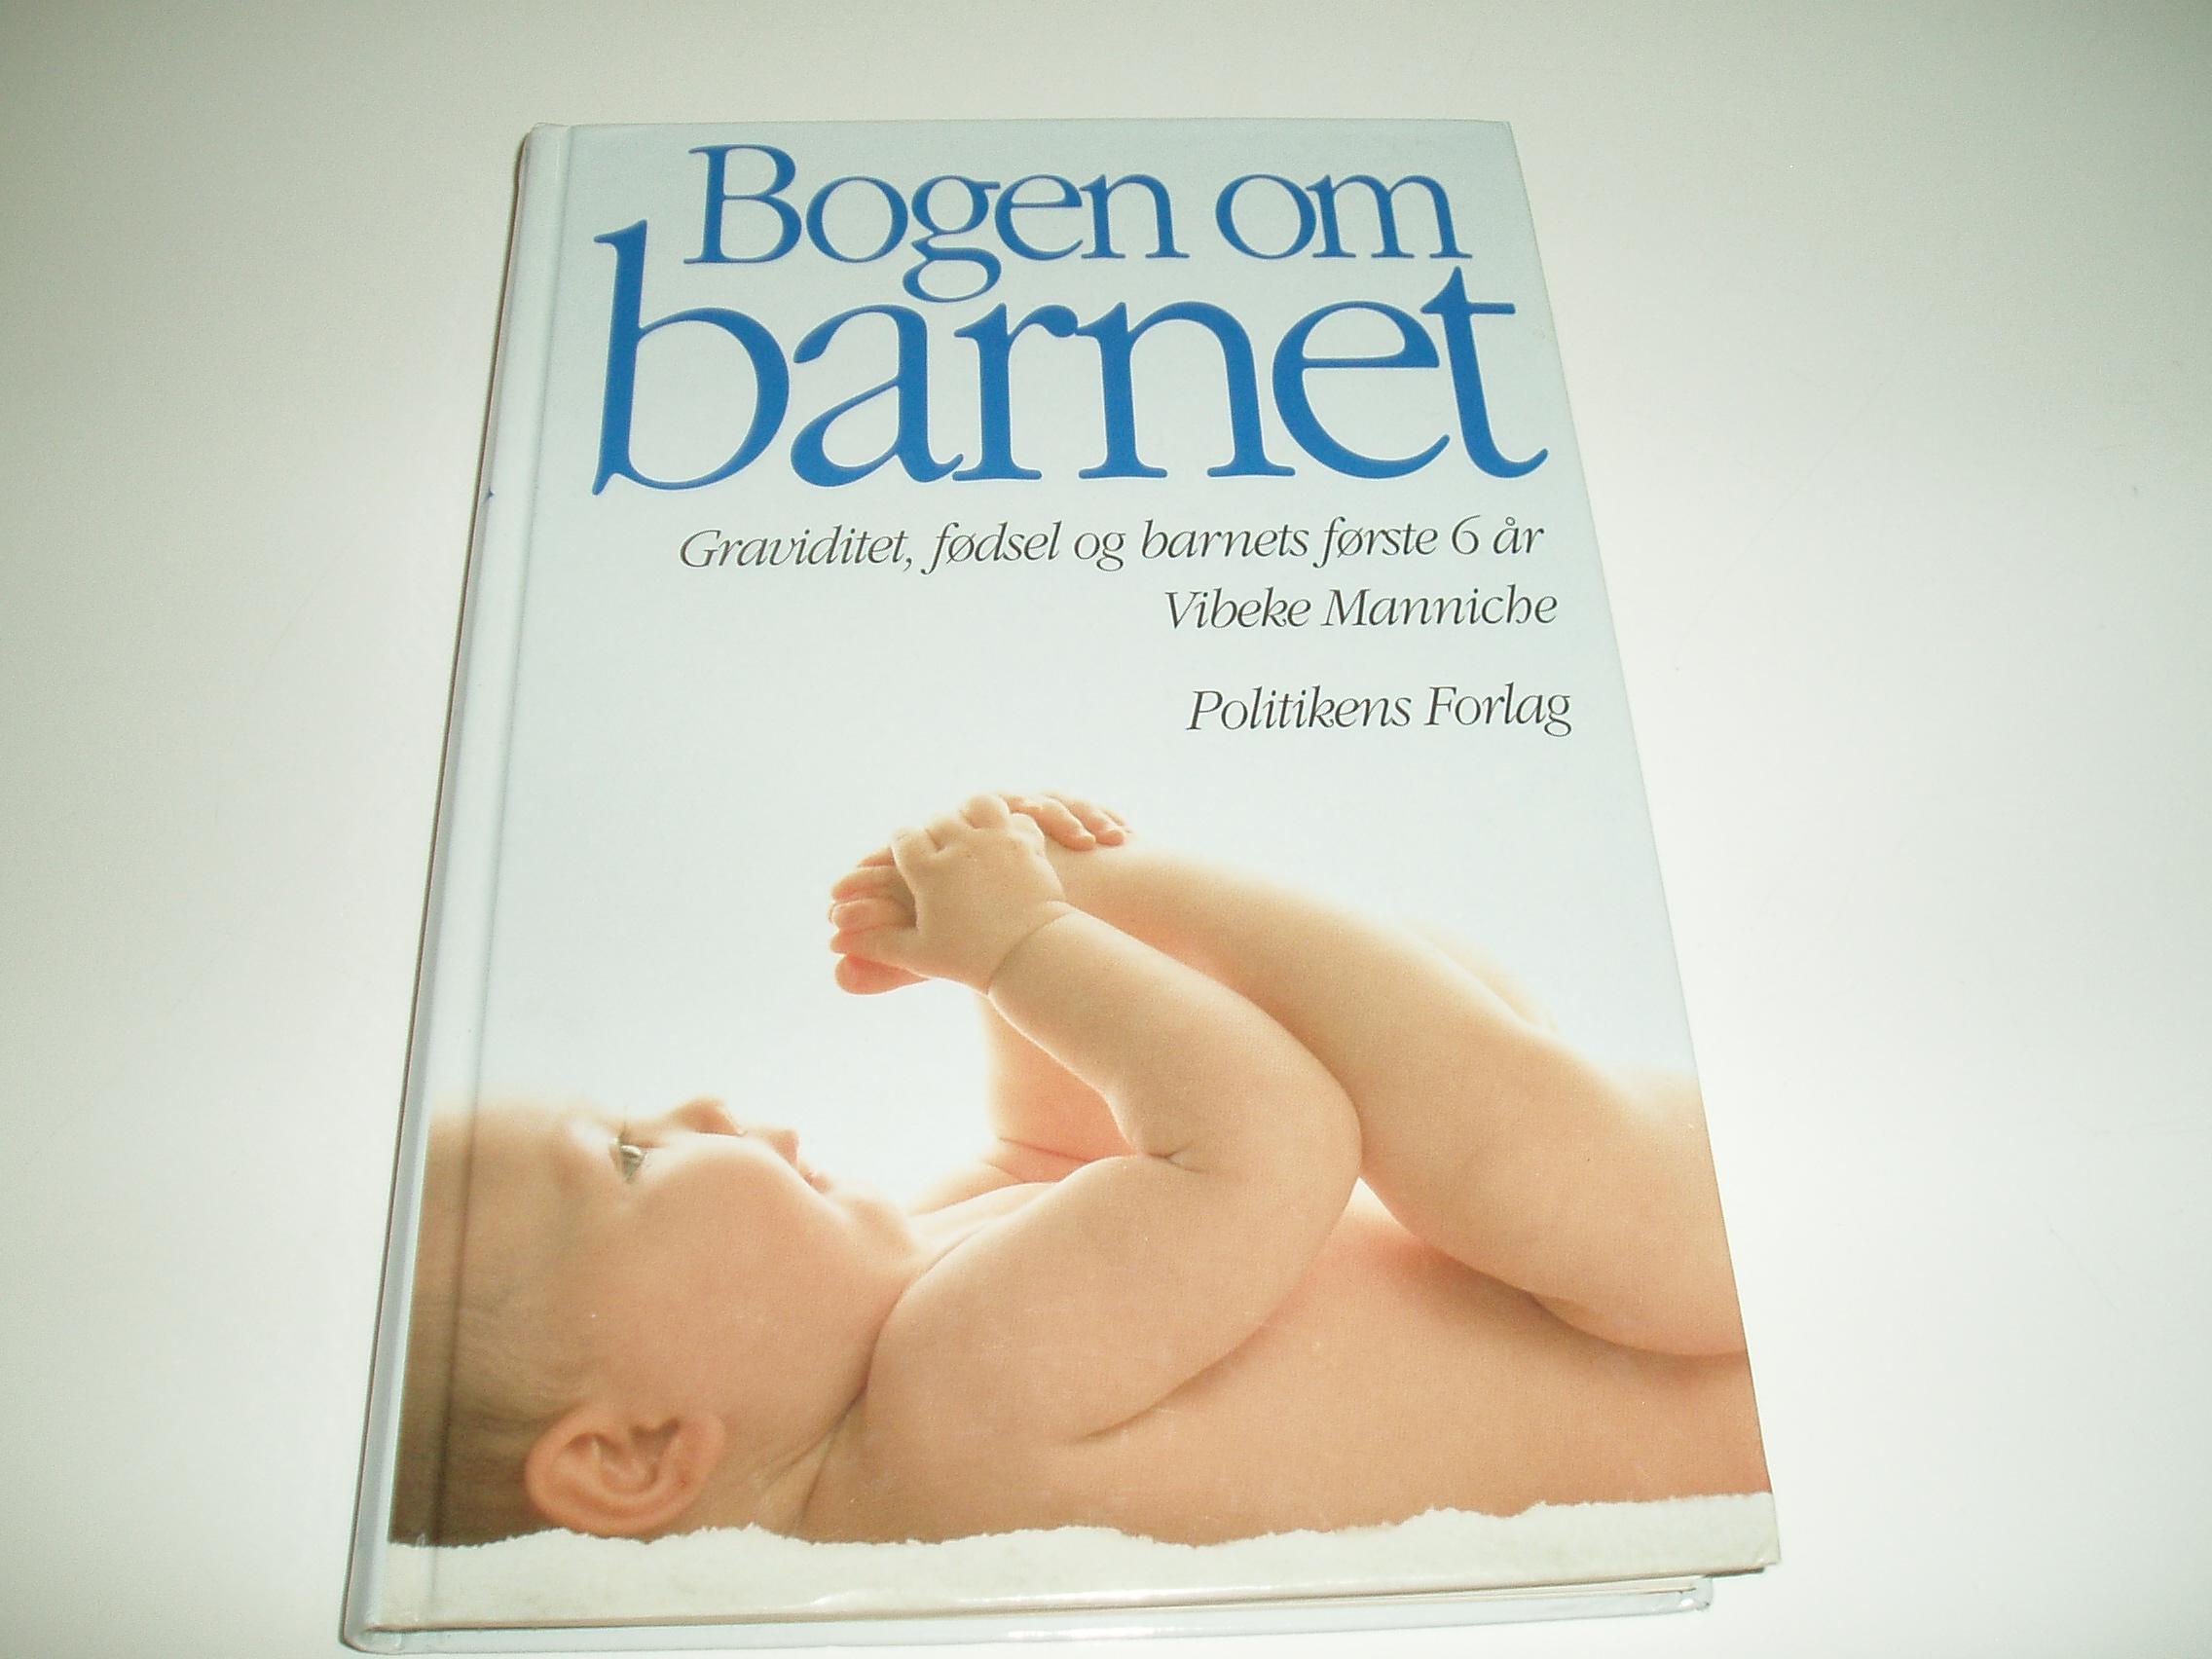 Bogen om barnet. Graviditet, fødsel og barnets første 6 år. 5. u